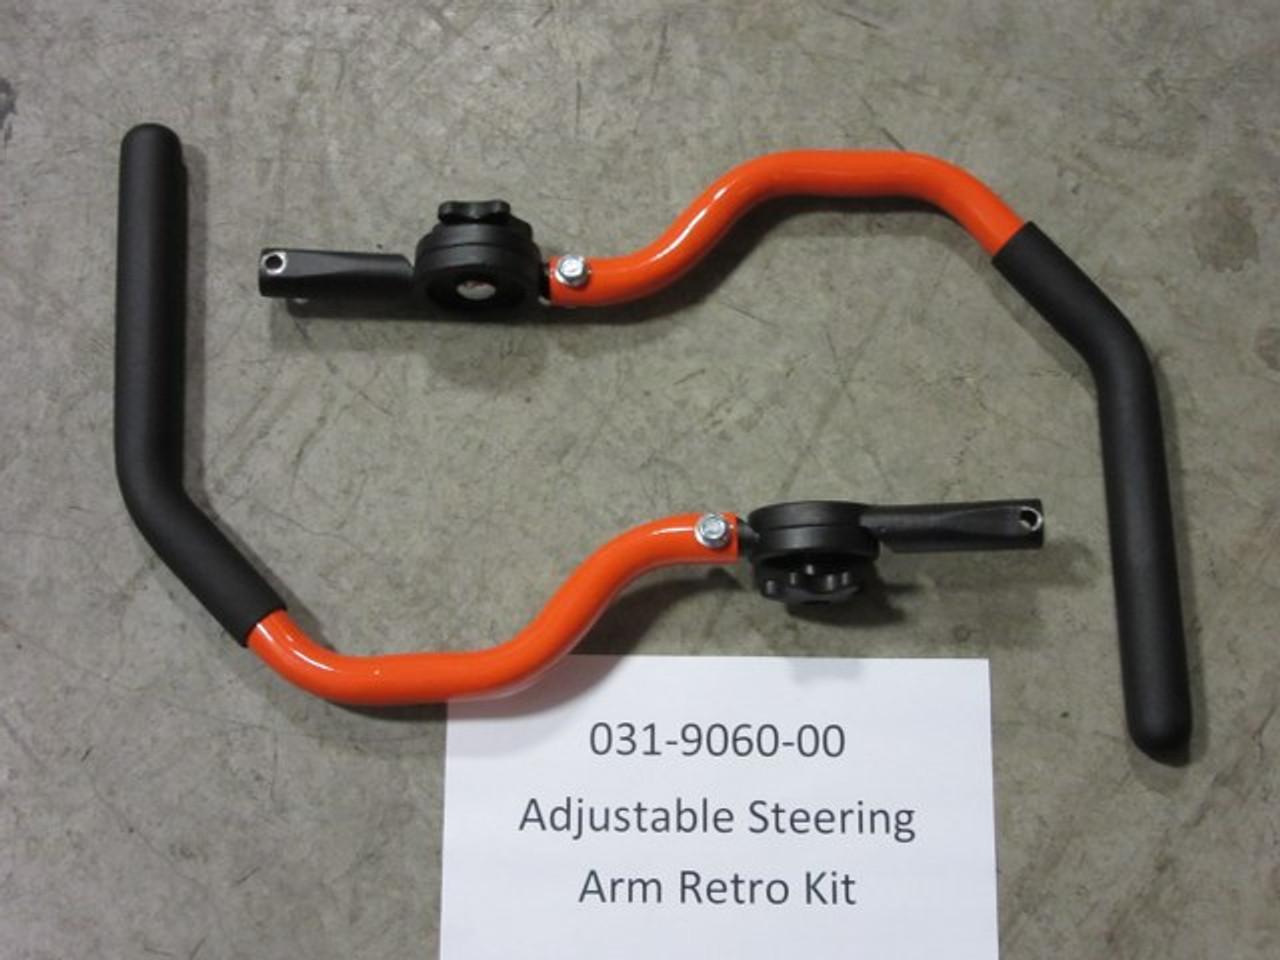 Bad Boy Mower OEM  031-9060-00 Adjustable Steering Arm Retro